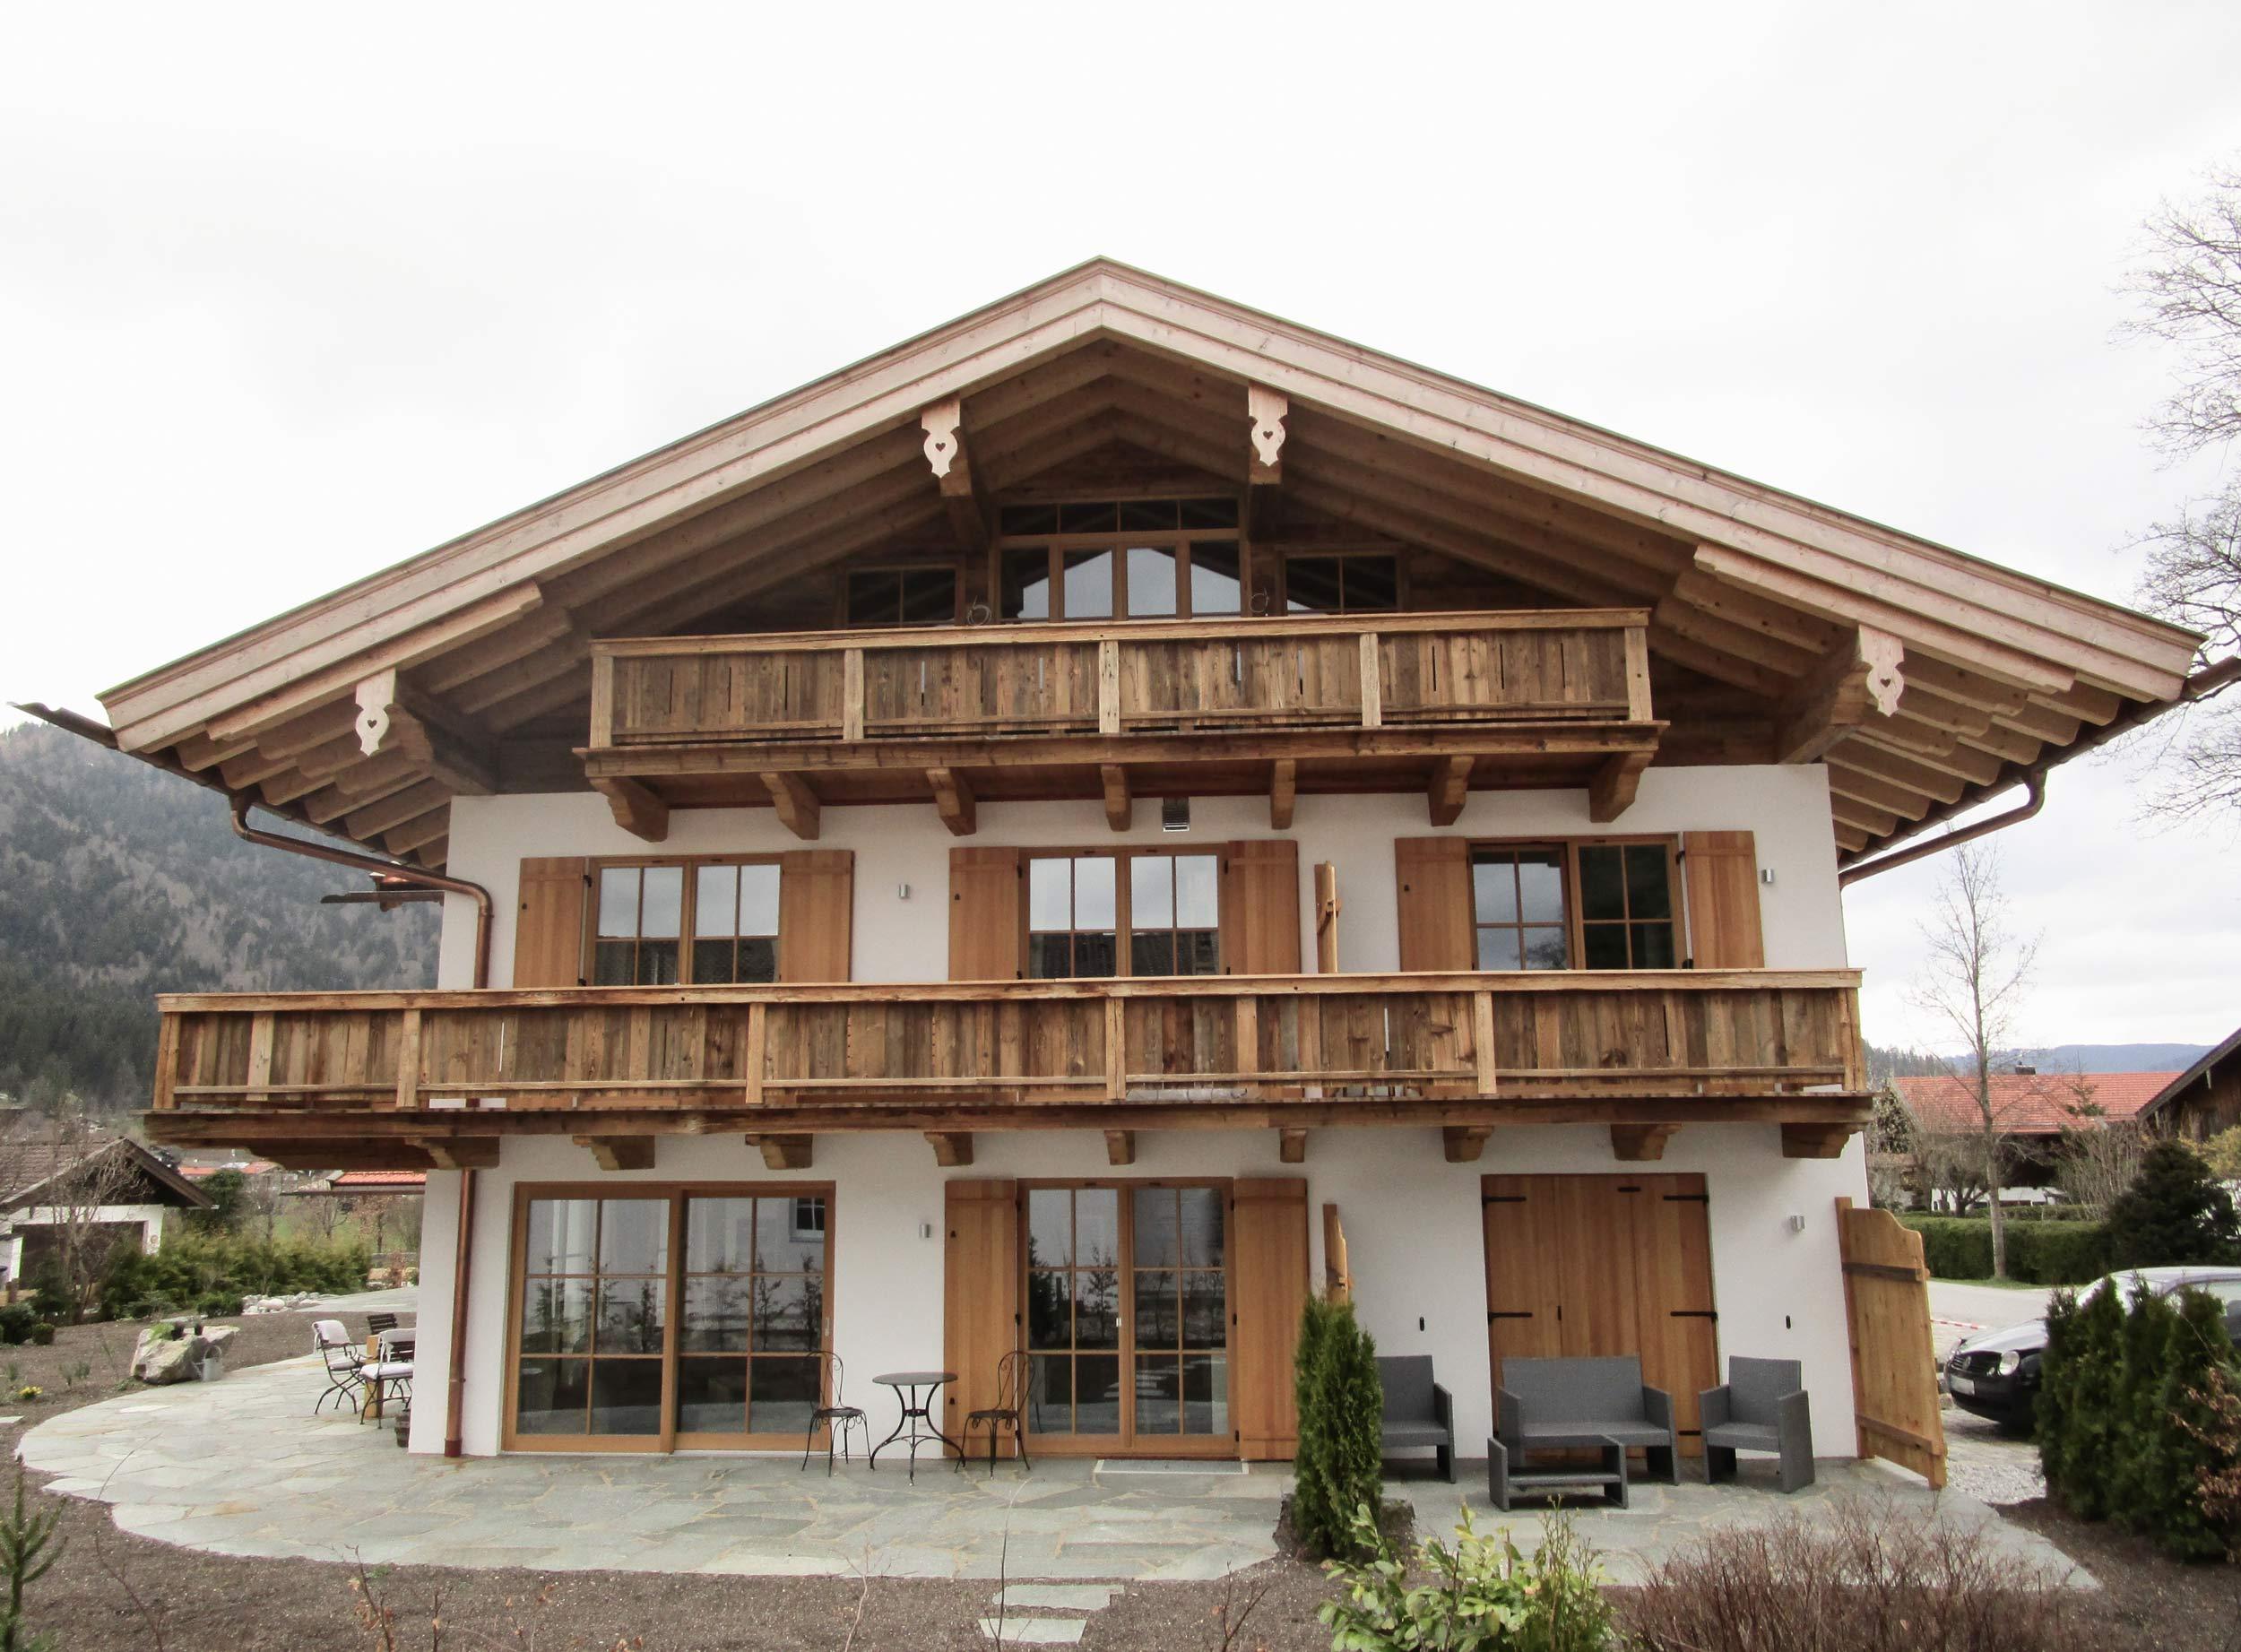 zimmerei-stoib-holzbau-holzhaus-altholz-fassade-blockschalung-merhfamilienhaus-balkon-03.jpg